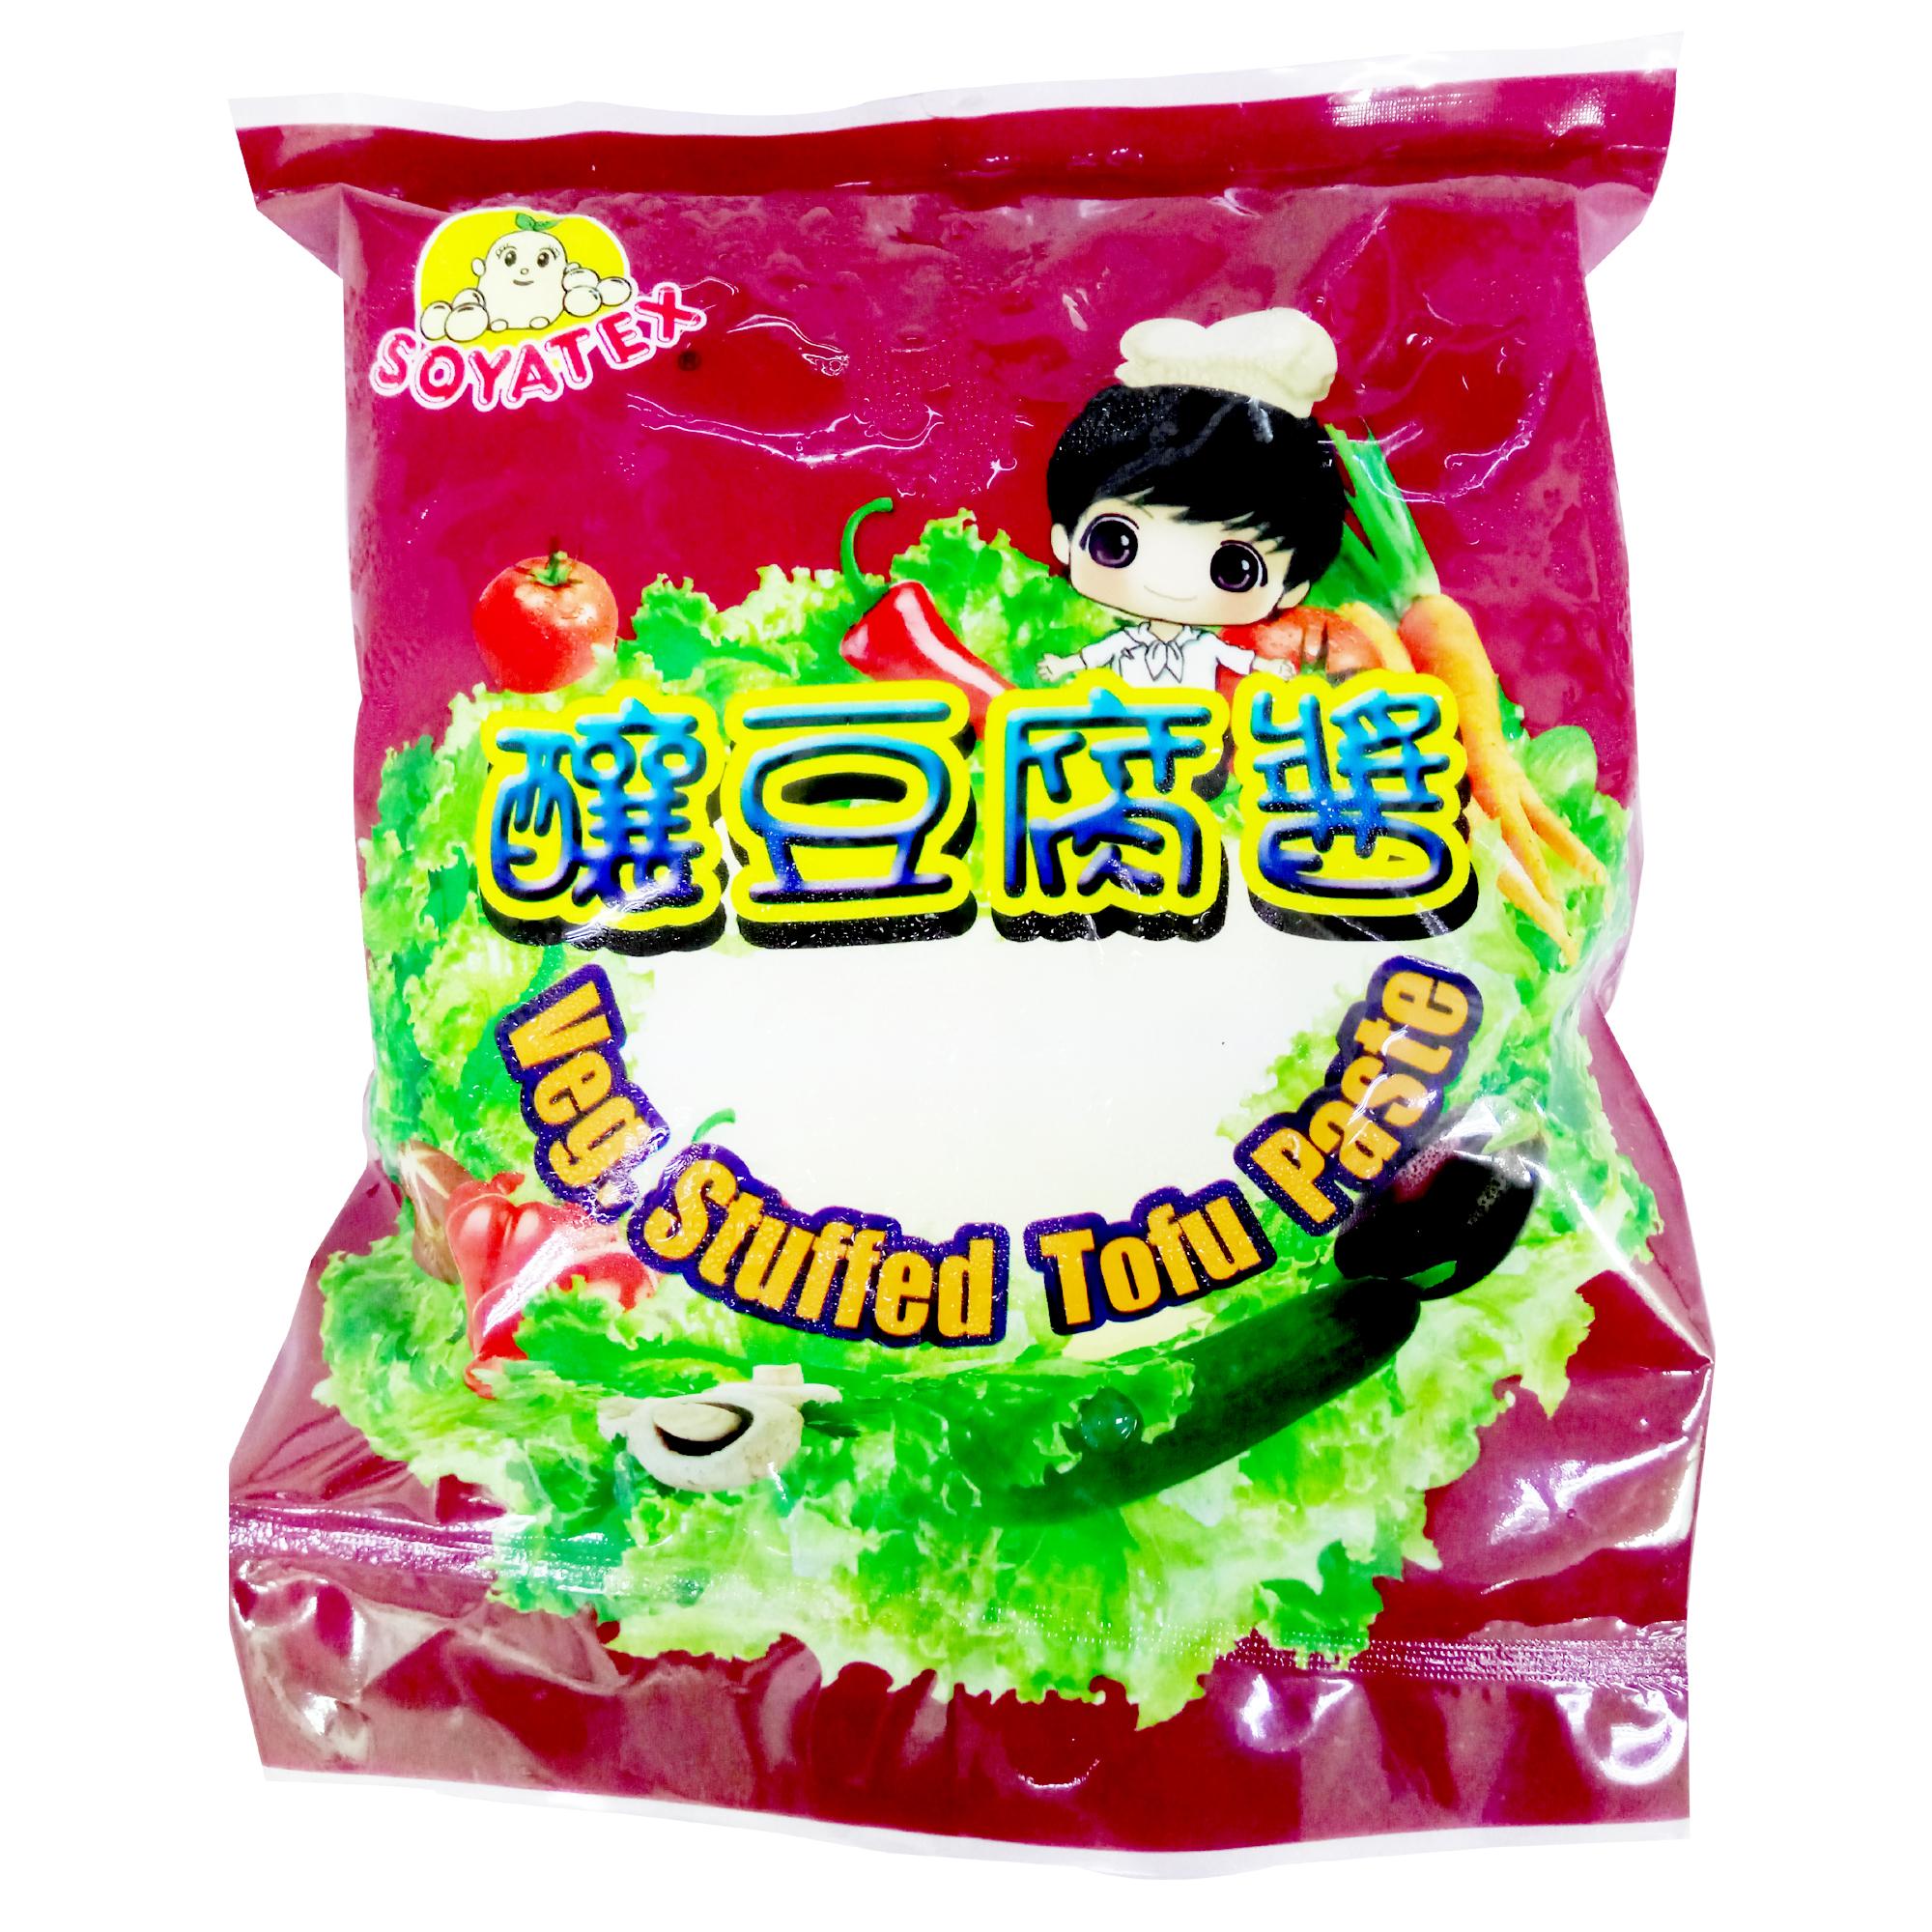 Image Stuffed Tofu Paste 益达兴酿豆腐酱 500grams